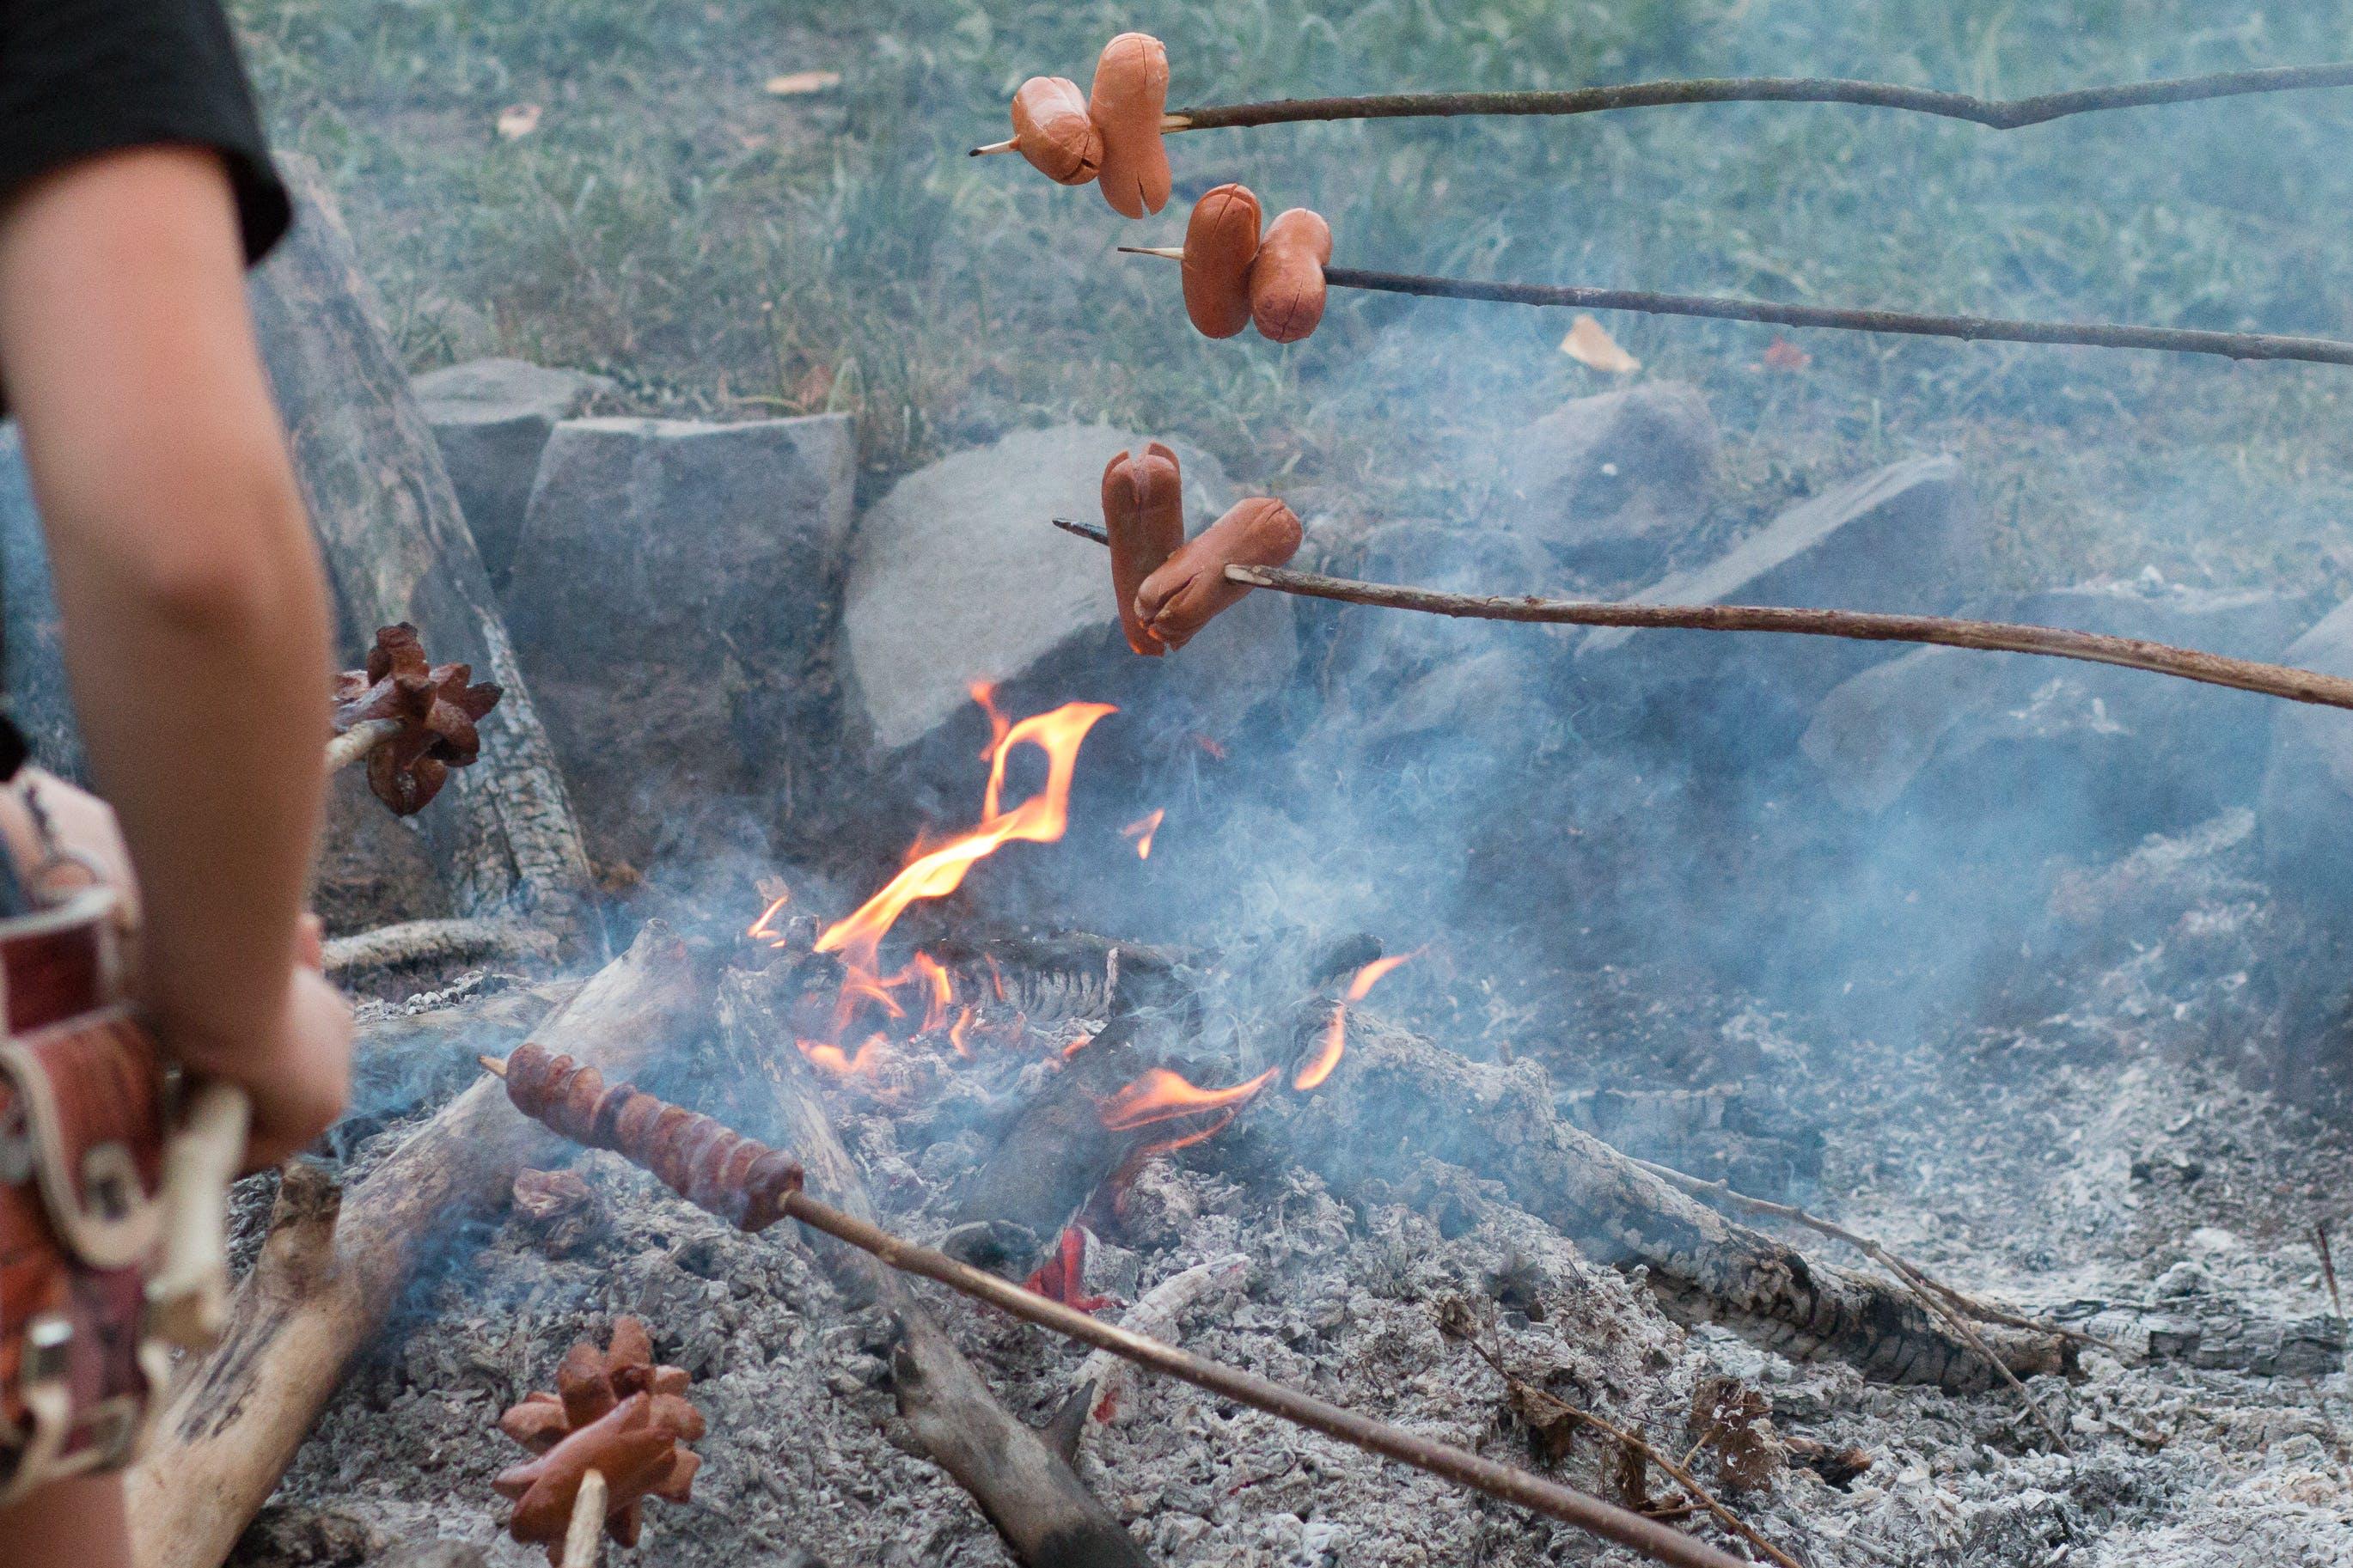 Free stock photo of baking on fire, baking sausage